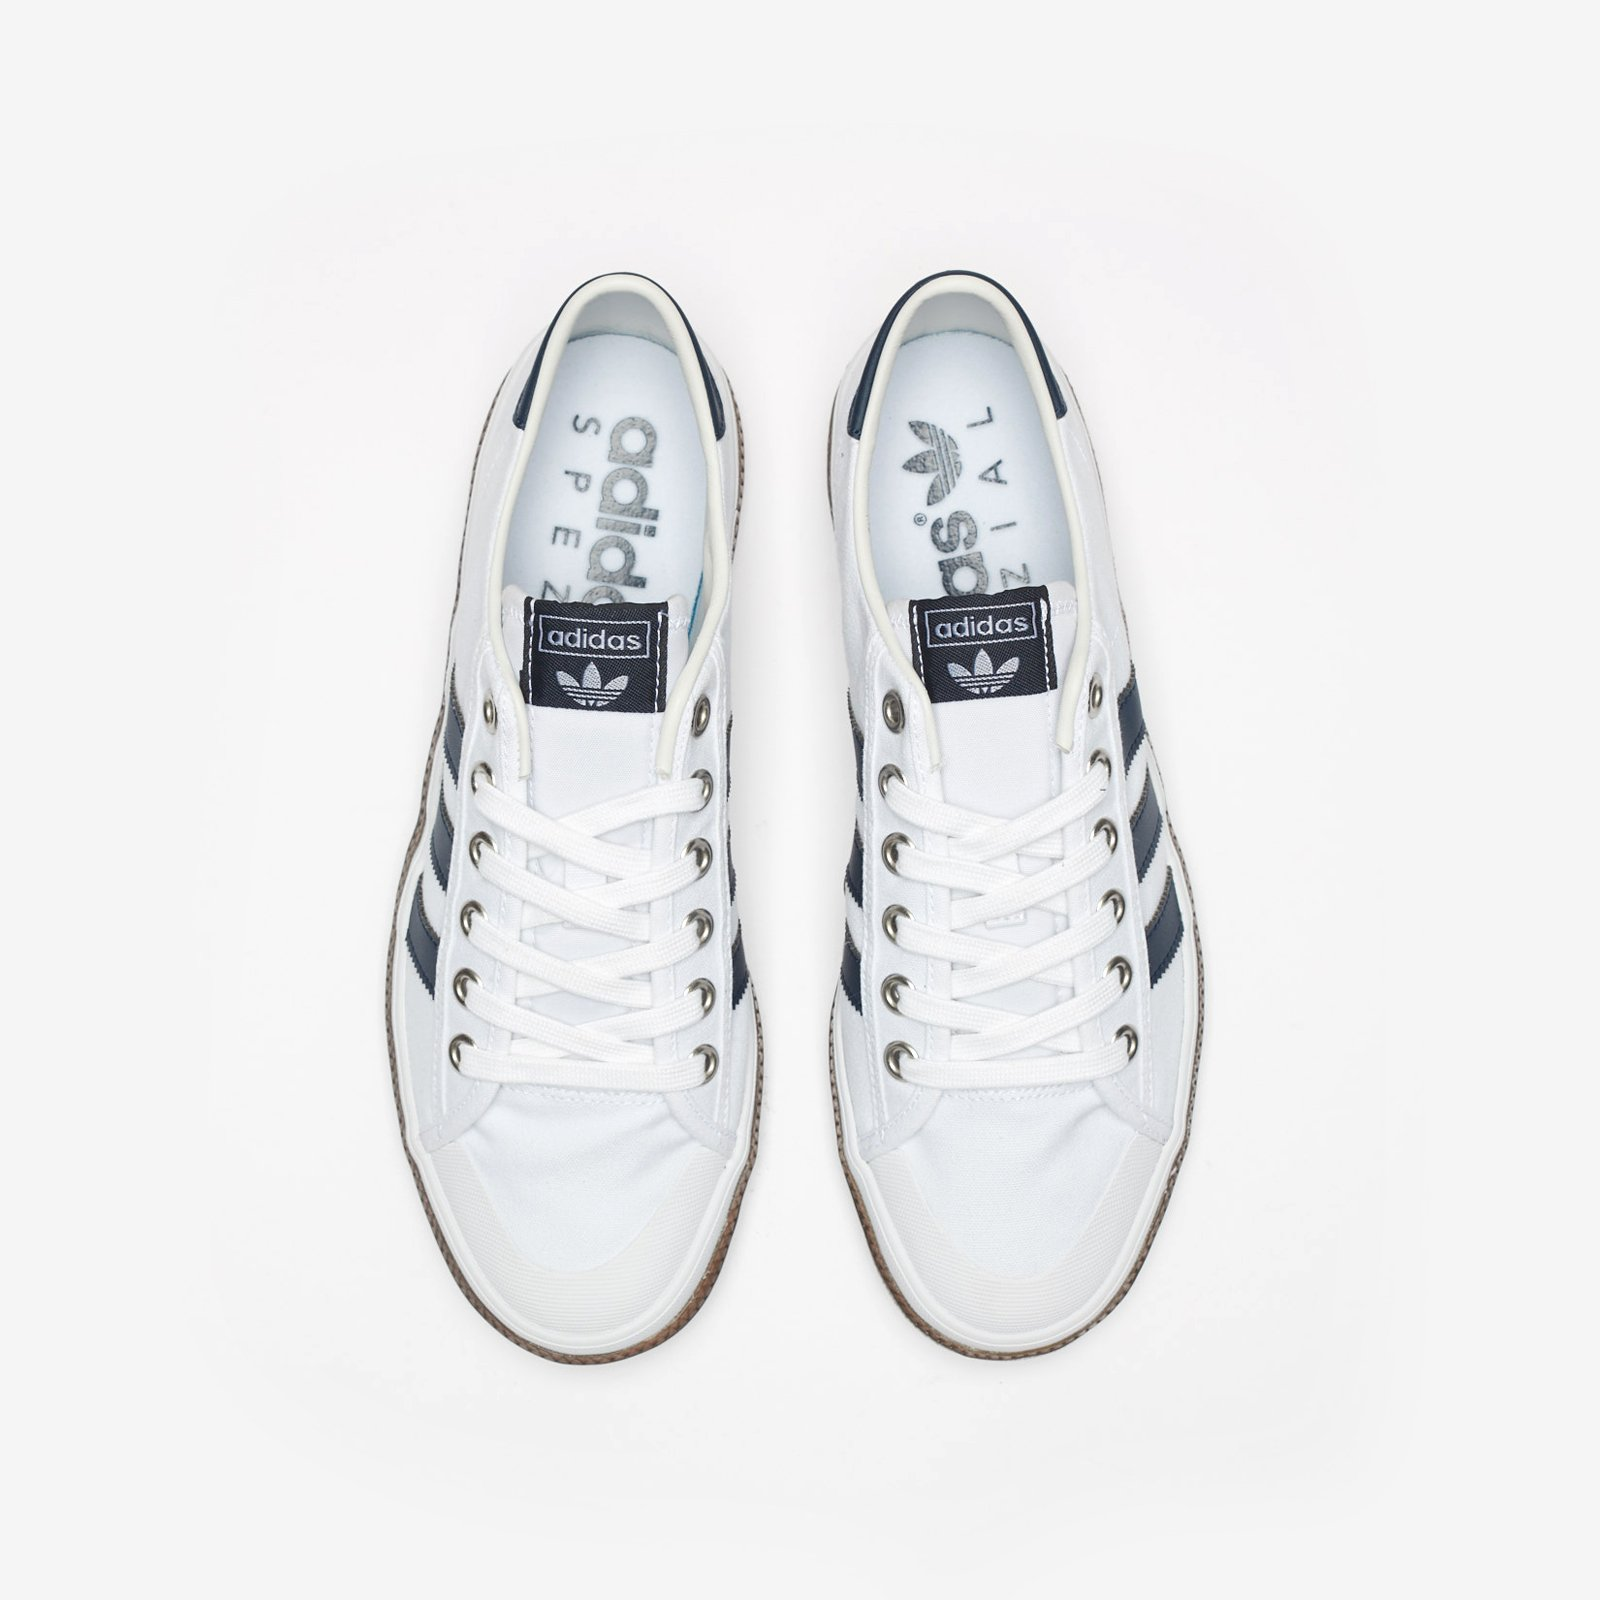 adidas Norfu - F35719 - Sneakersnstuff